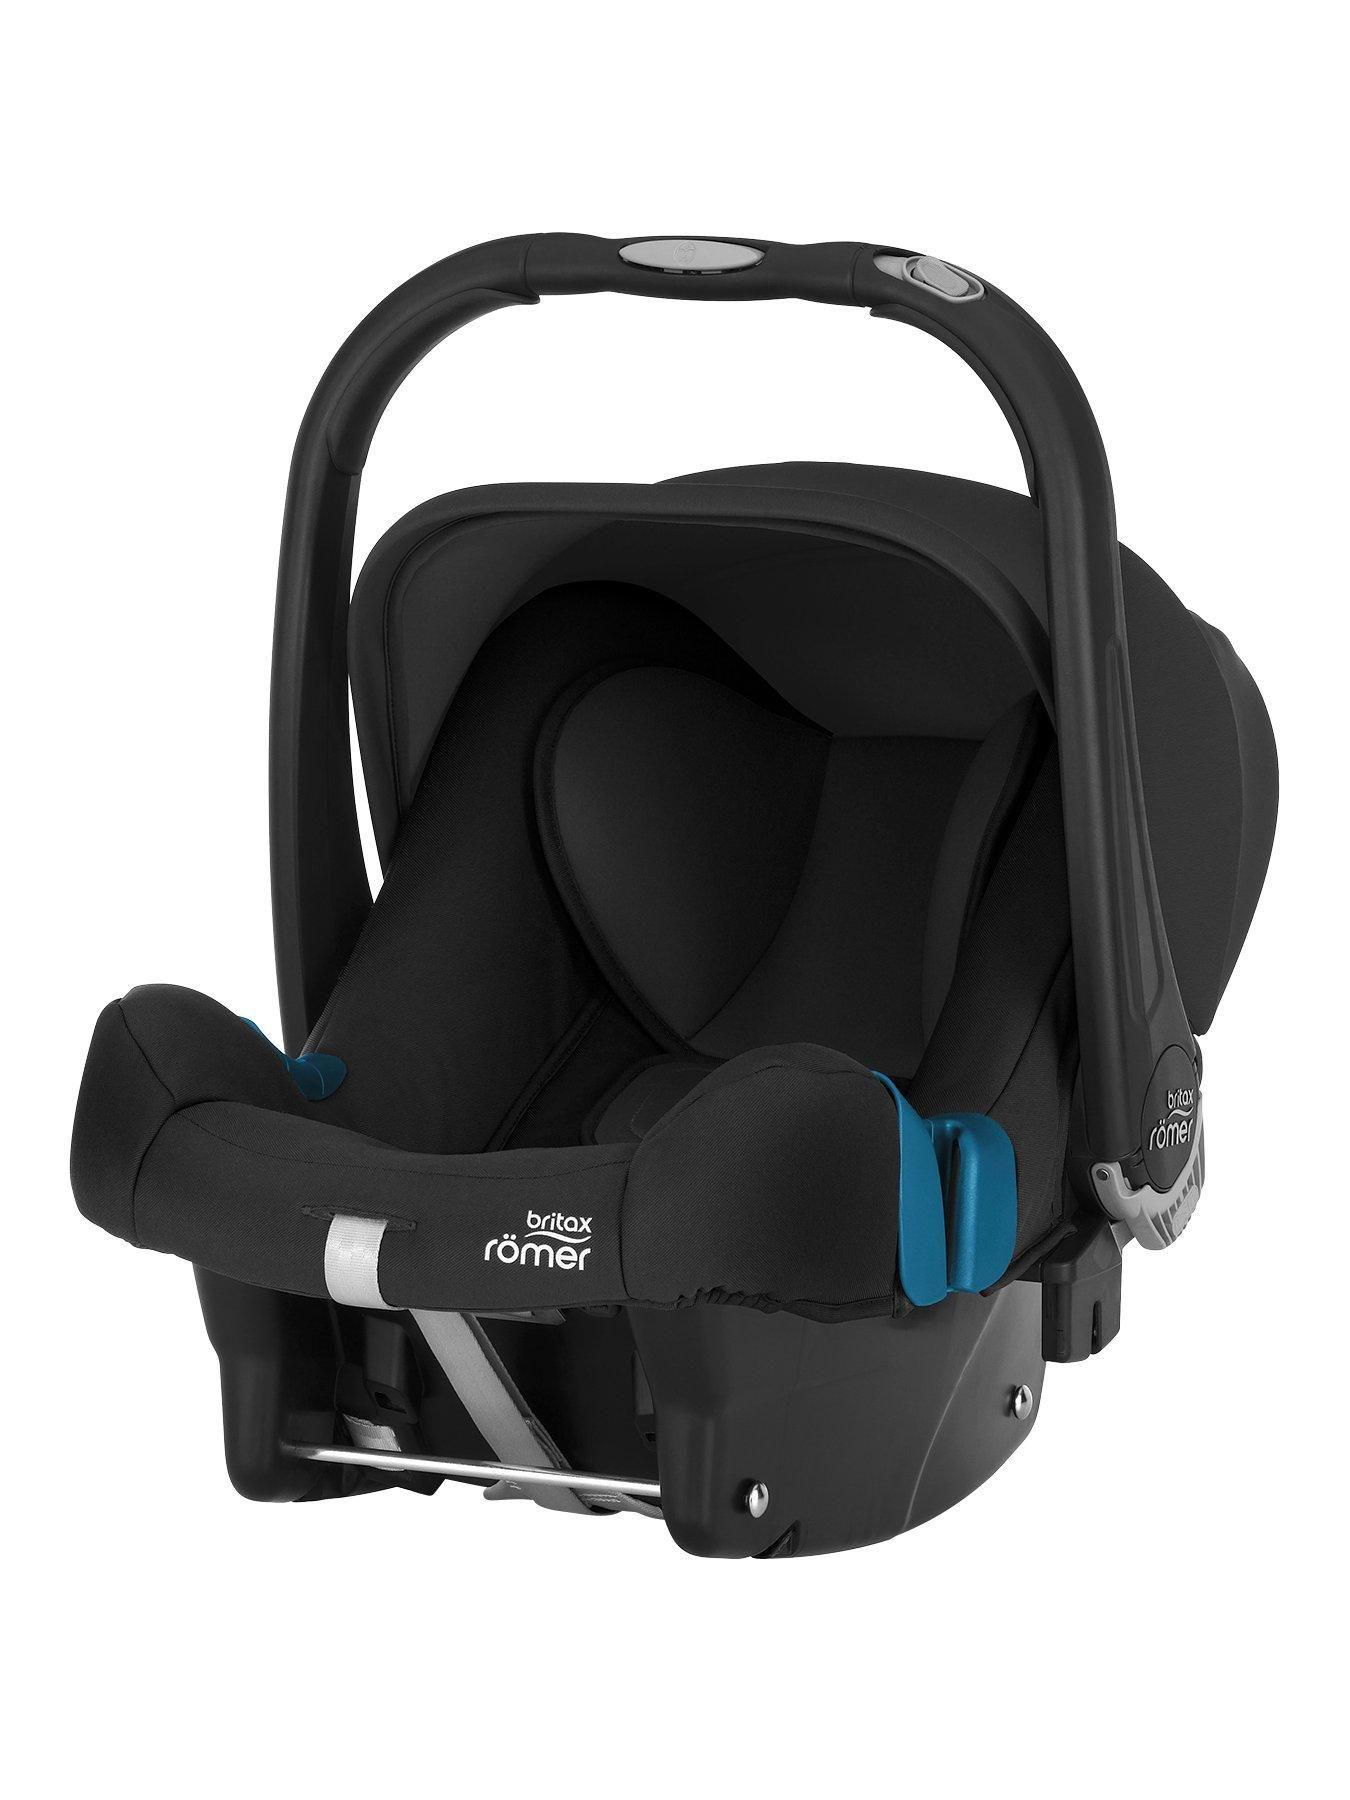 Britax Römer Britax Romer BabySafe Plus Shr II Car Seat